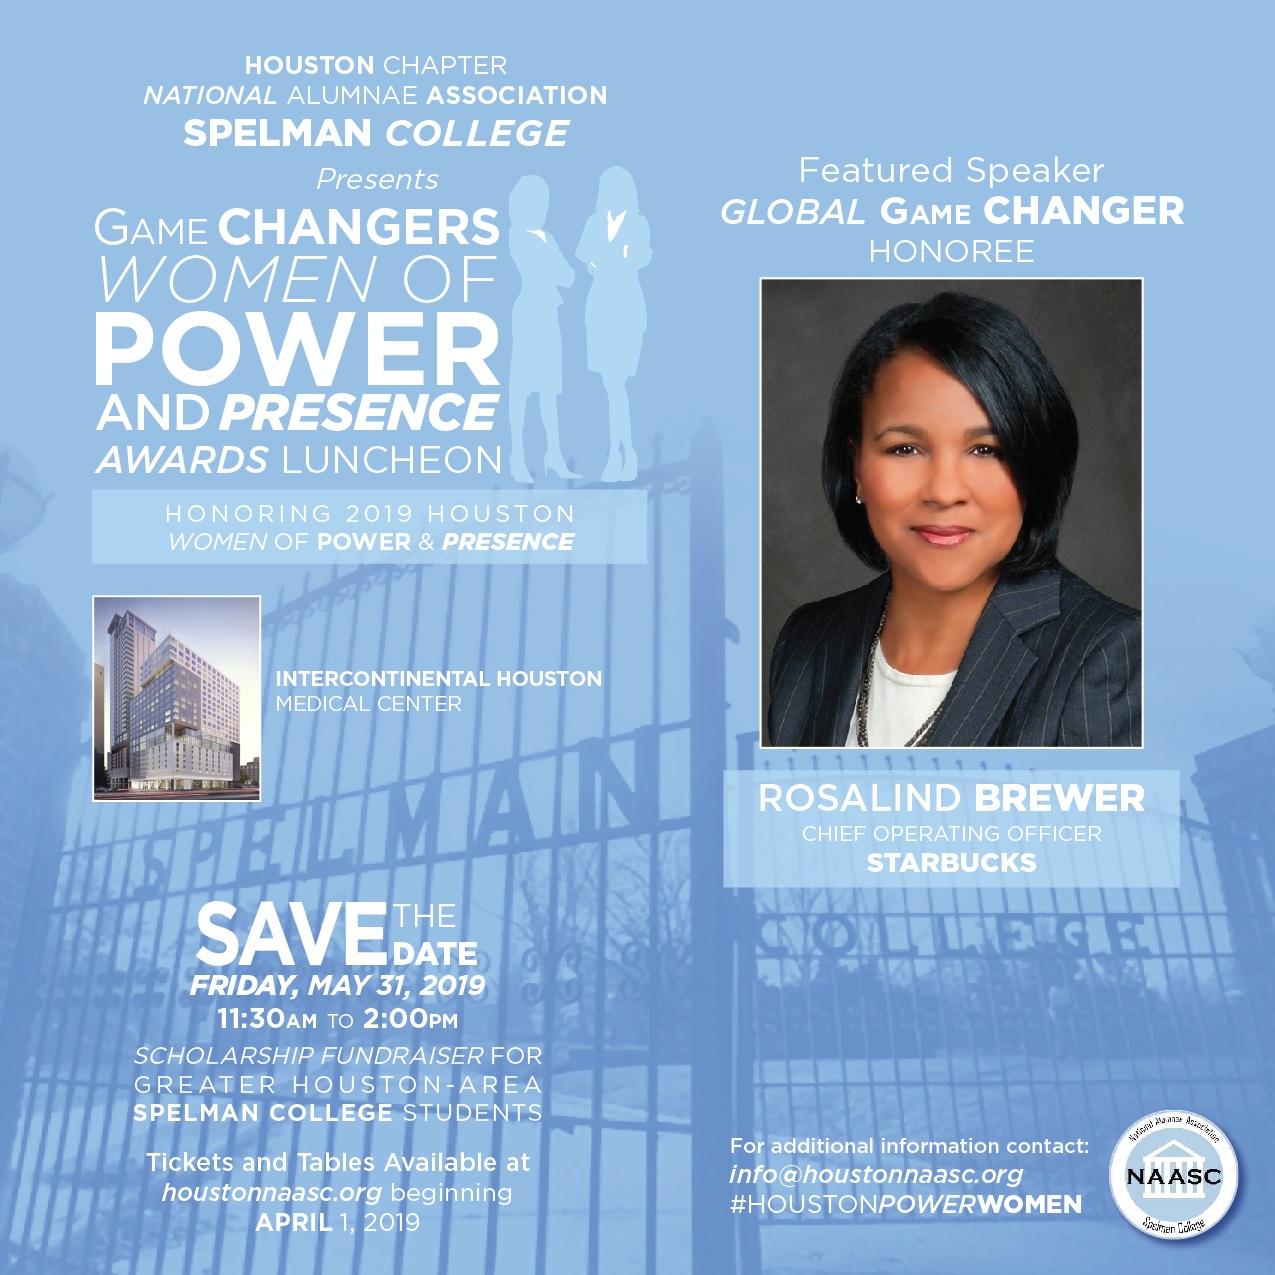 Global Game Changer - Ms. Rosalind Brewer '84